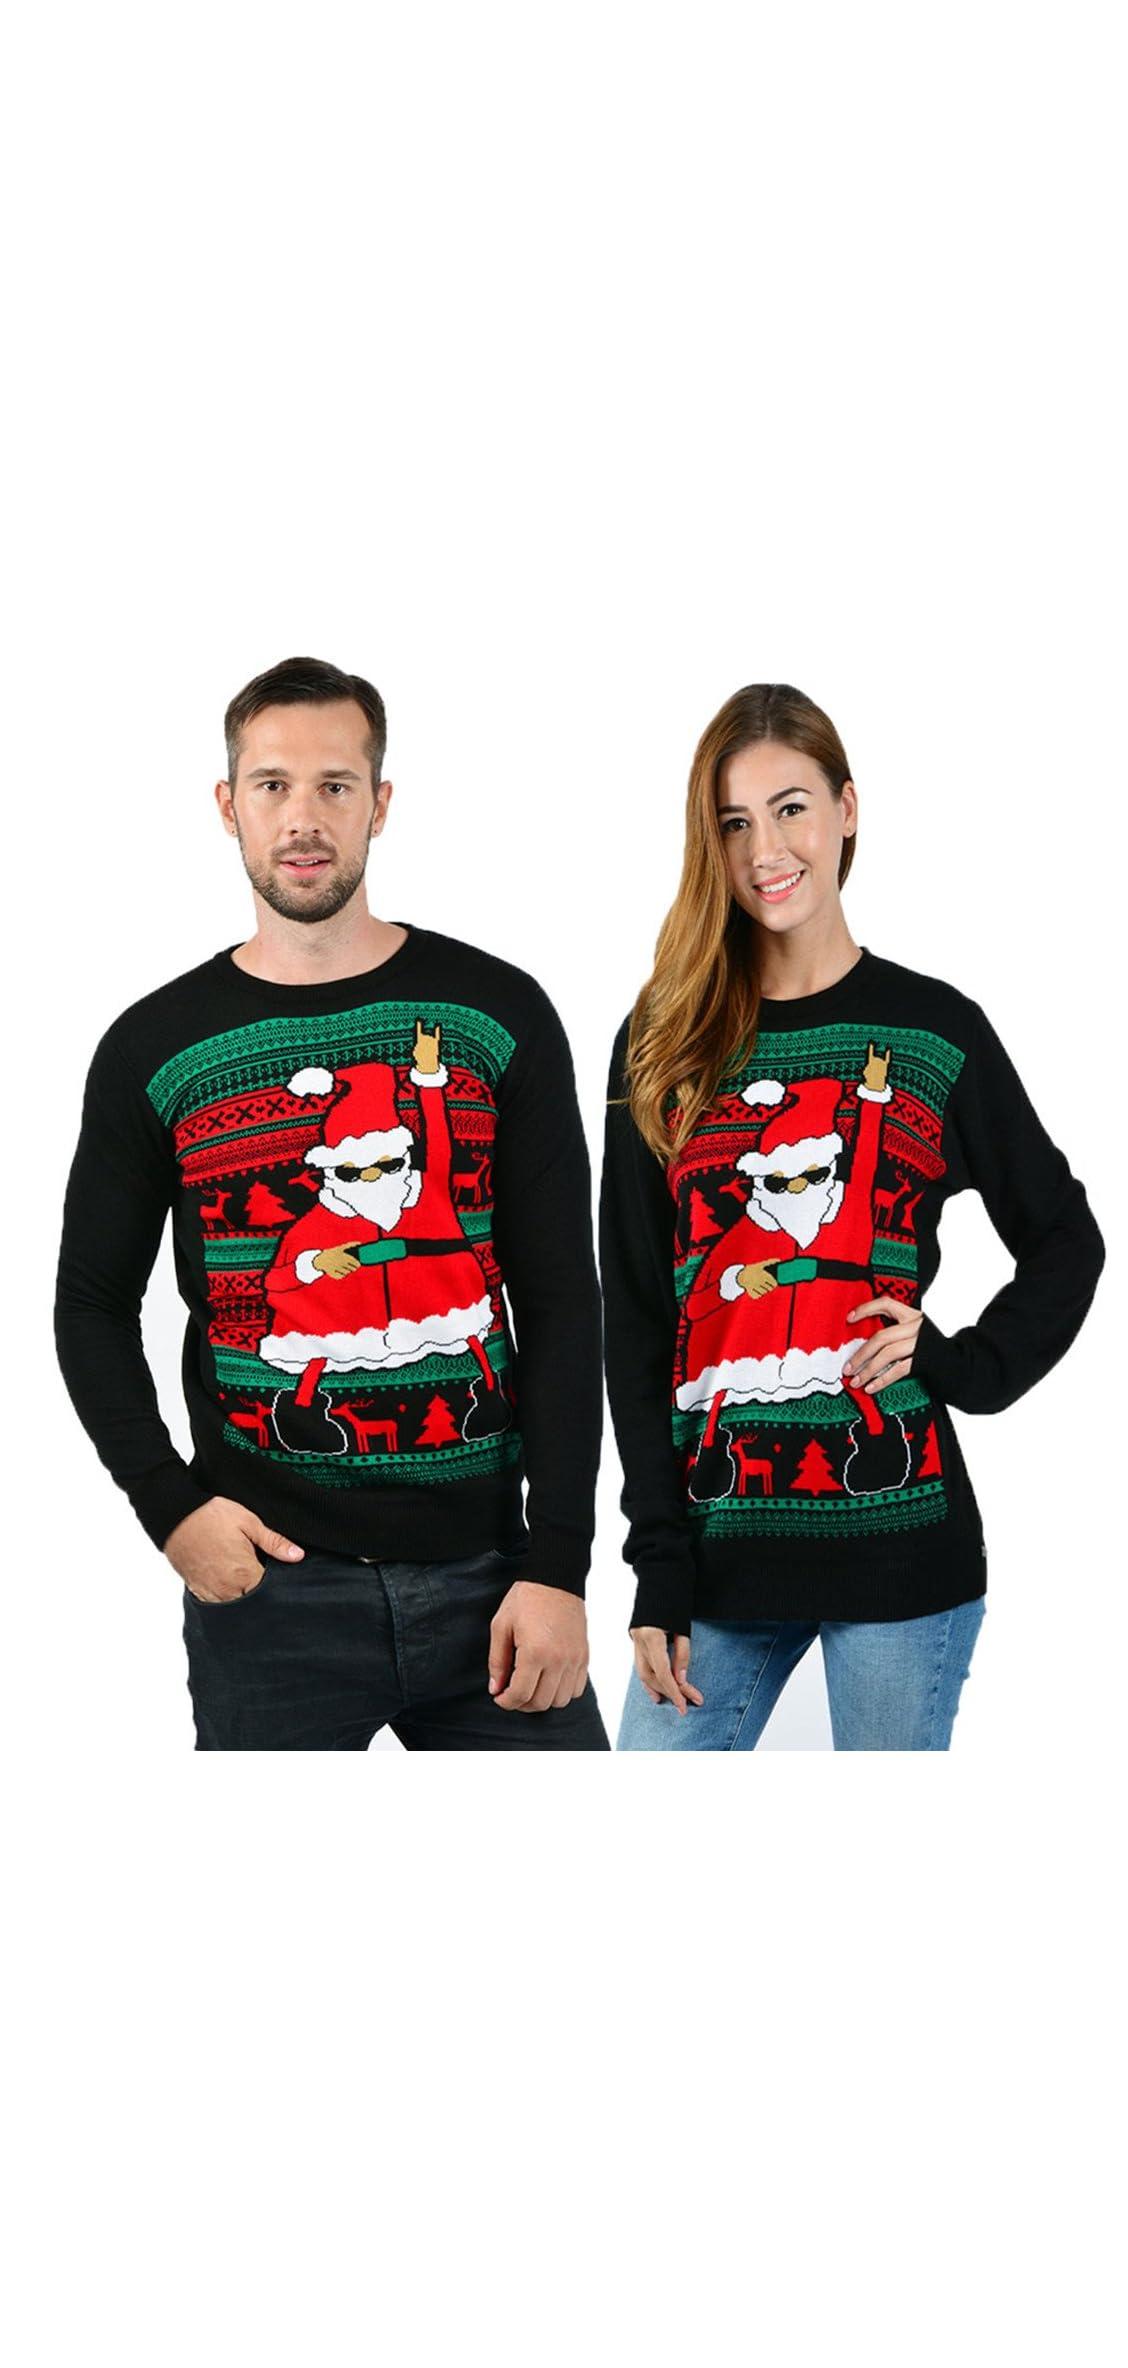 Unisex Ugly Christmas Sweaters Long Sleeve Round Neck